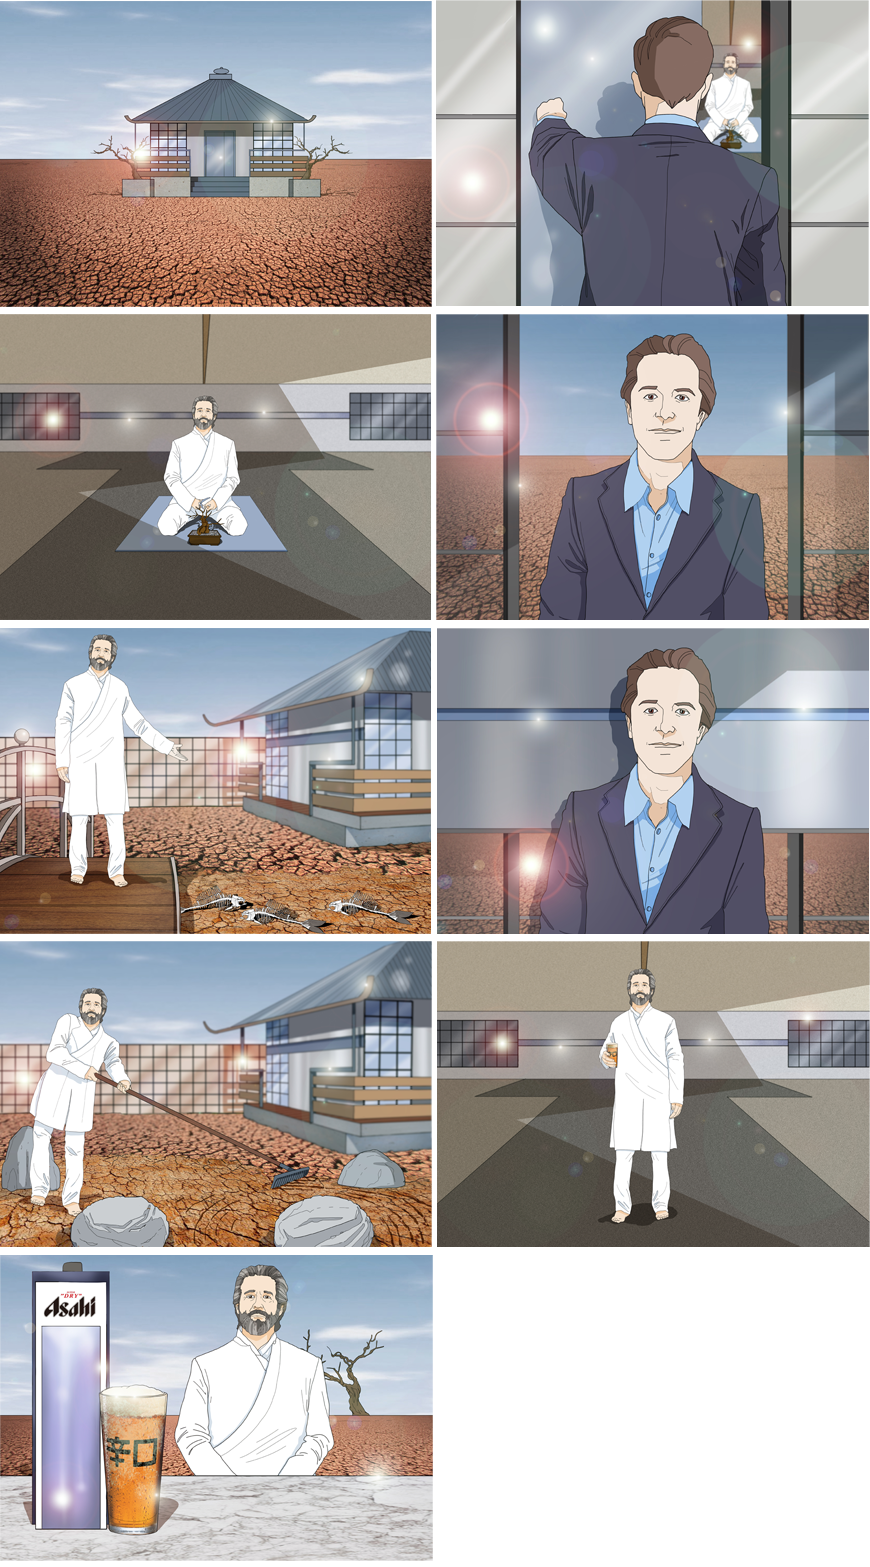 storyboard-asahi-1